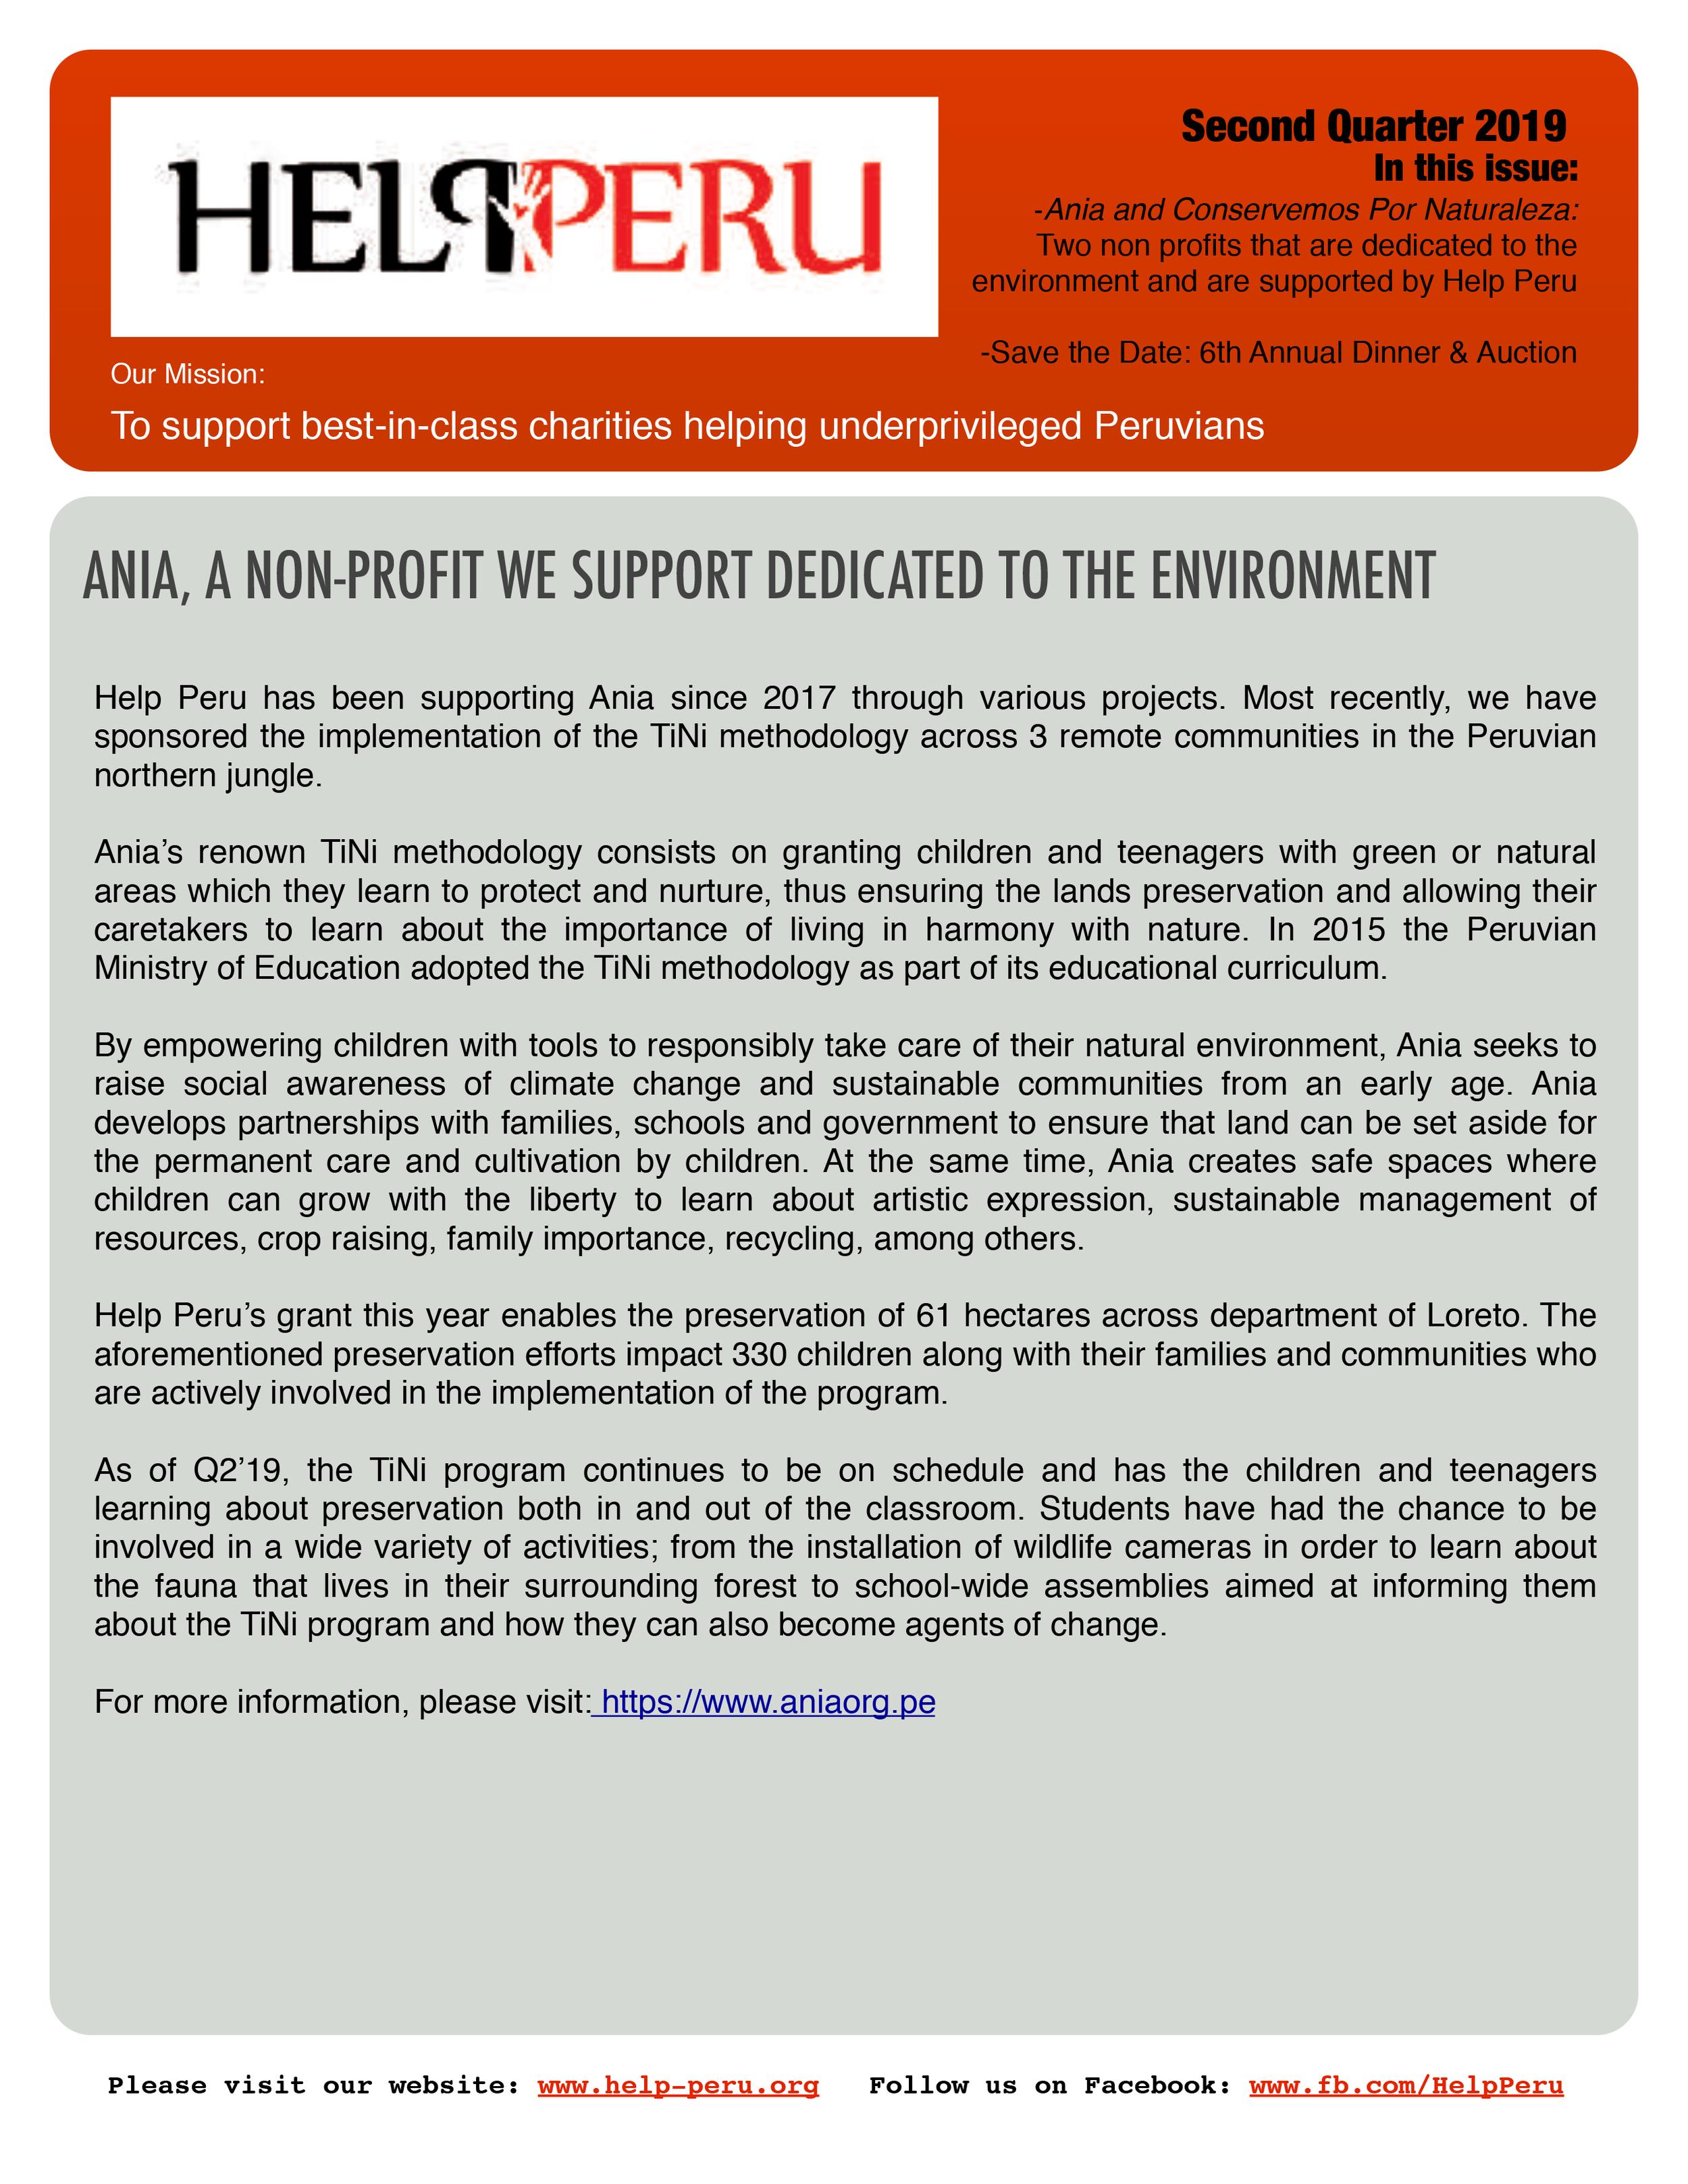 Help Peru Bulletin 2Q 2019